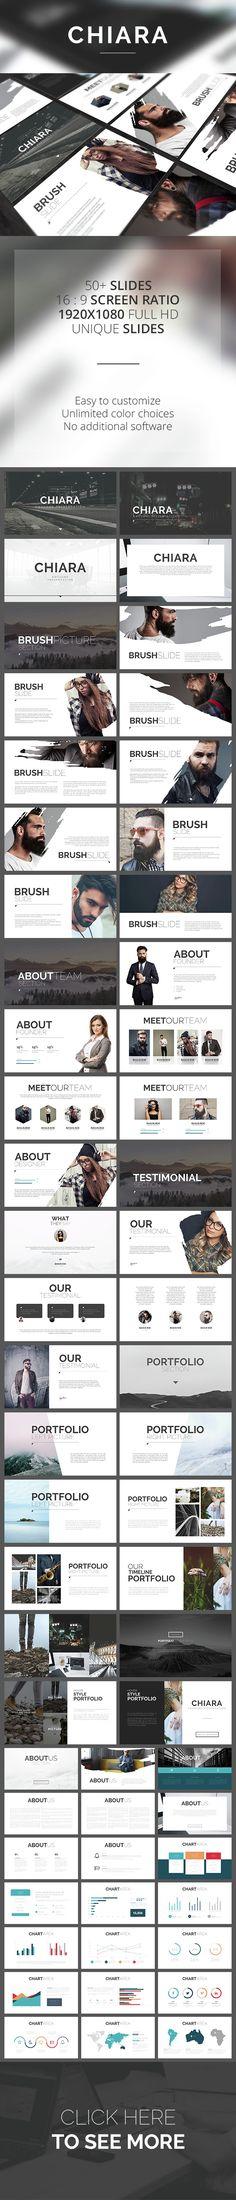 50:50 powerpoint template | templates | pinterest | ppt design, Presentation templates